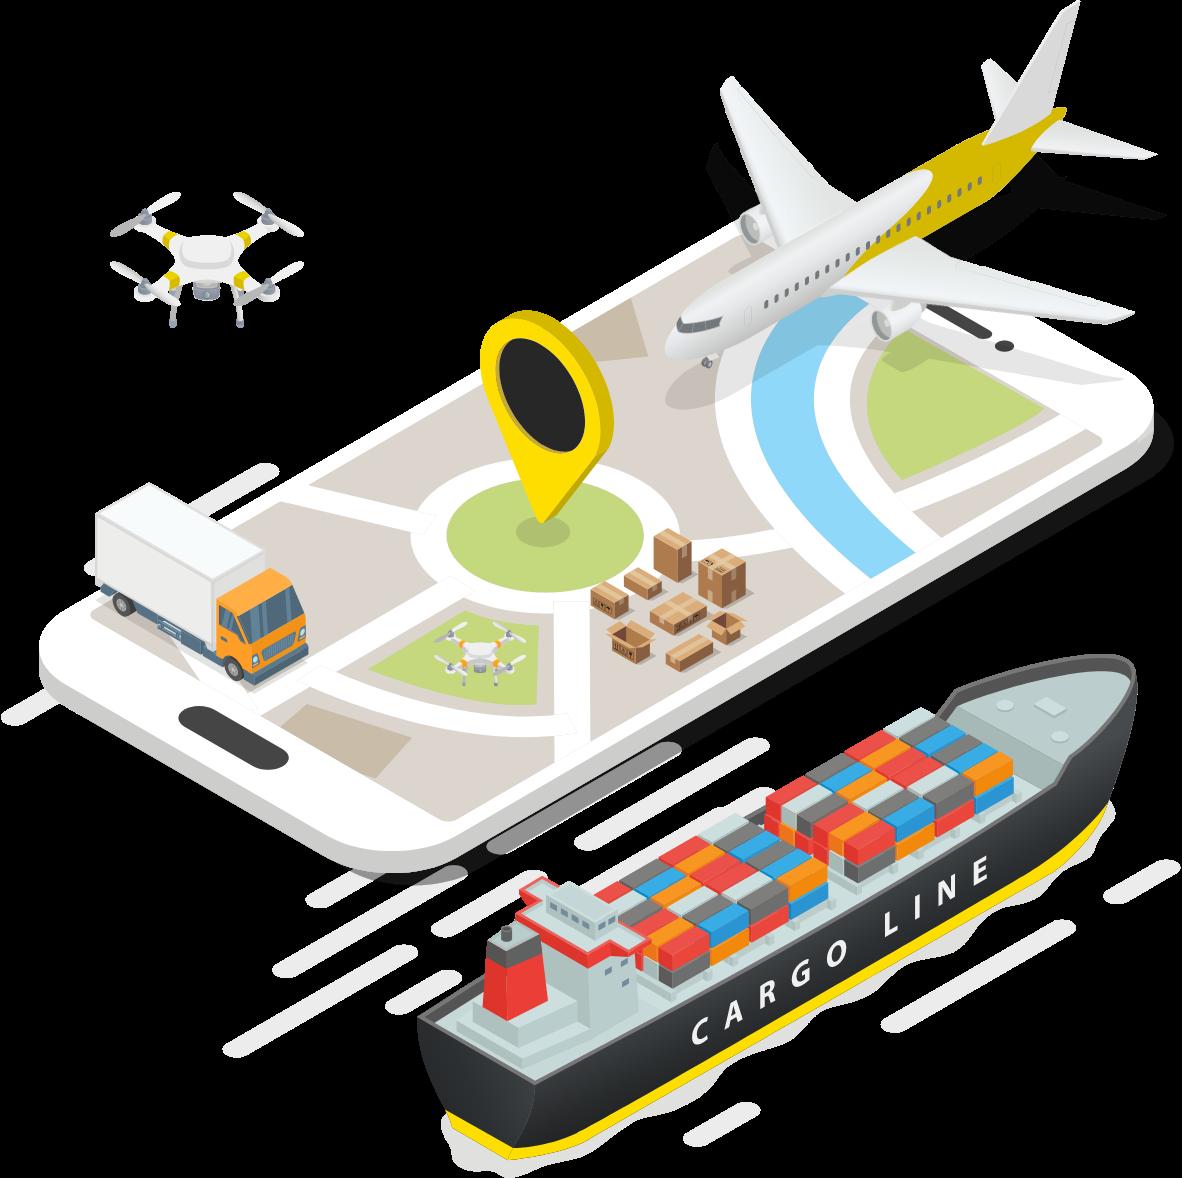 Custom Transportation Management Systems